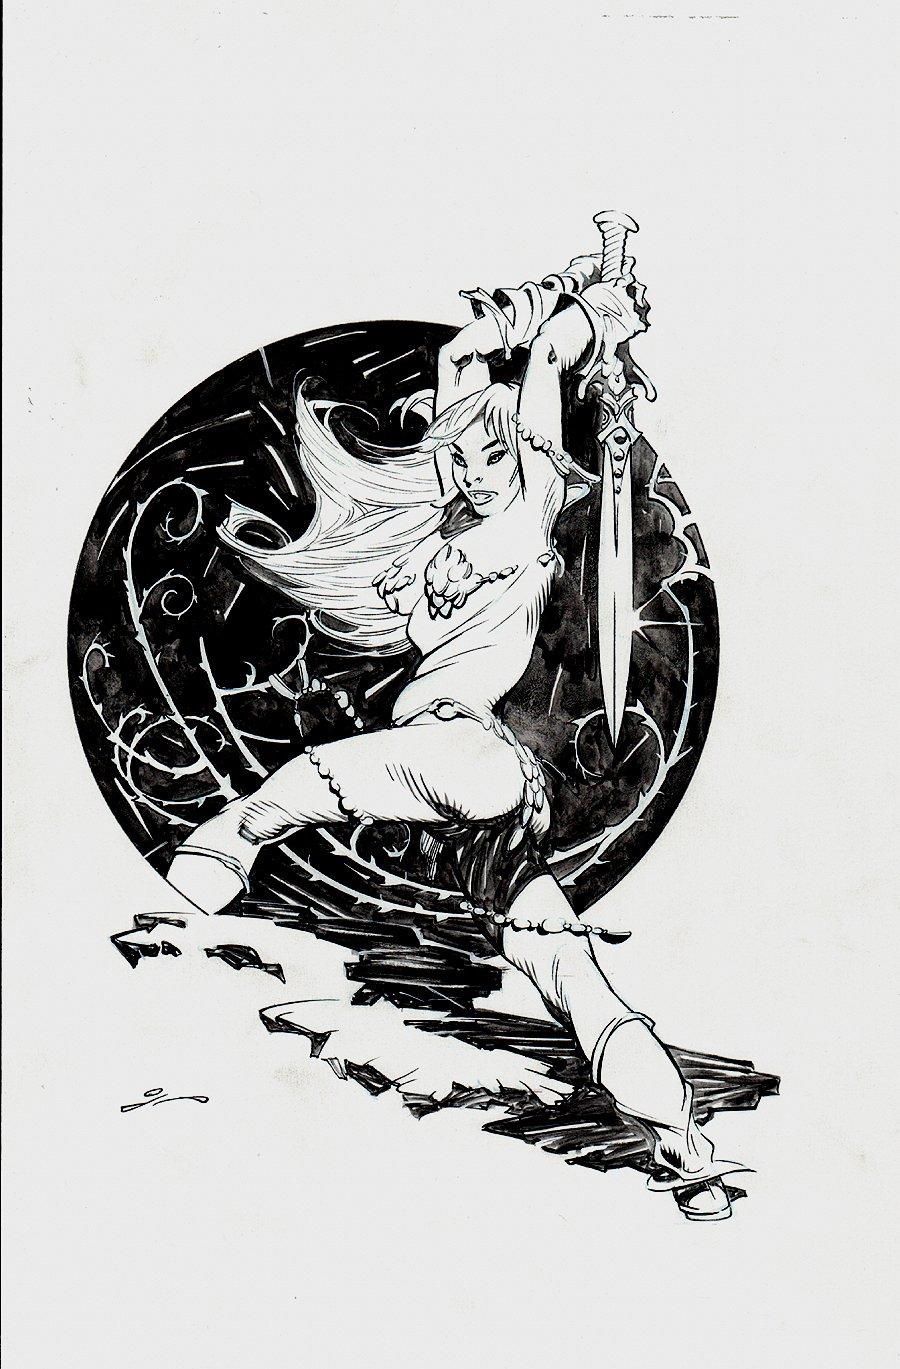 Red Sonja Swinging Sword Pinup